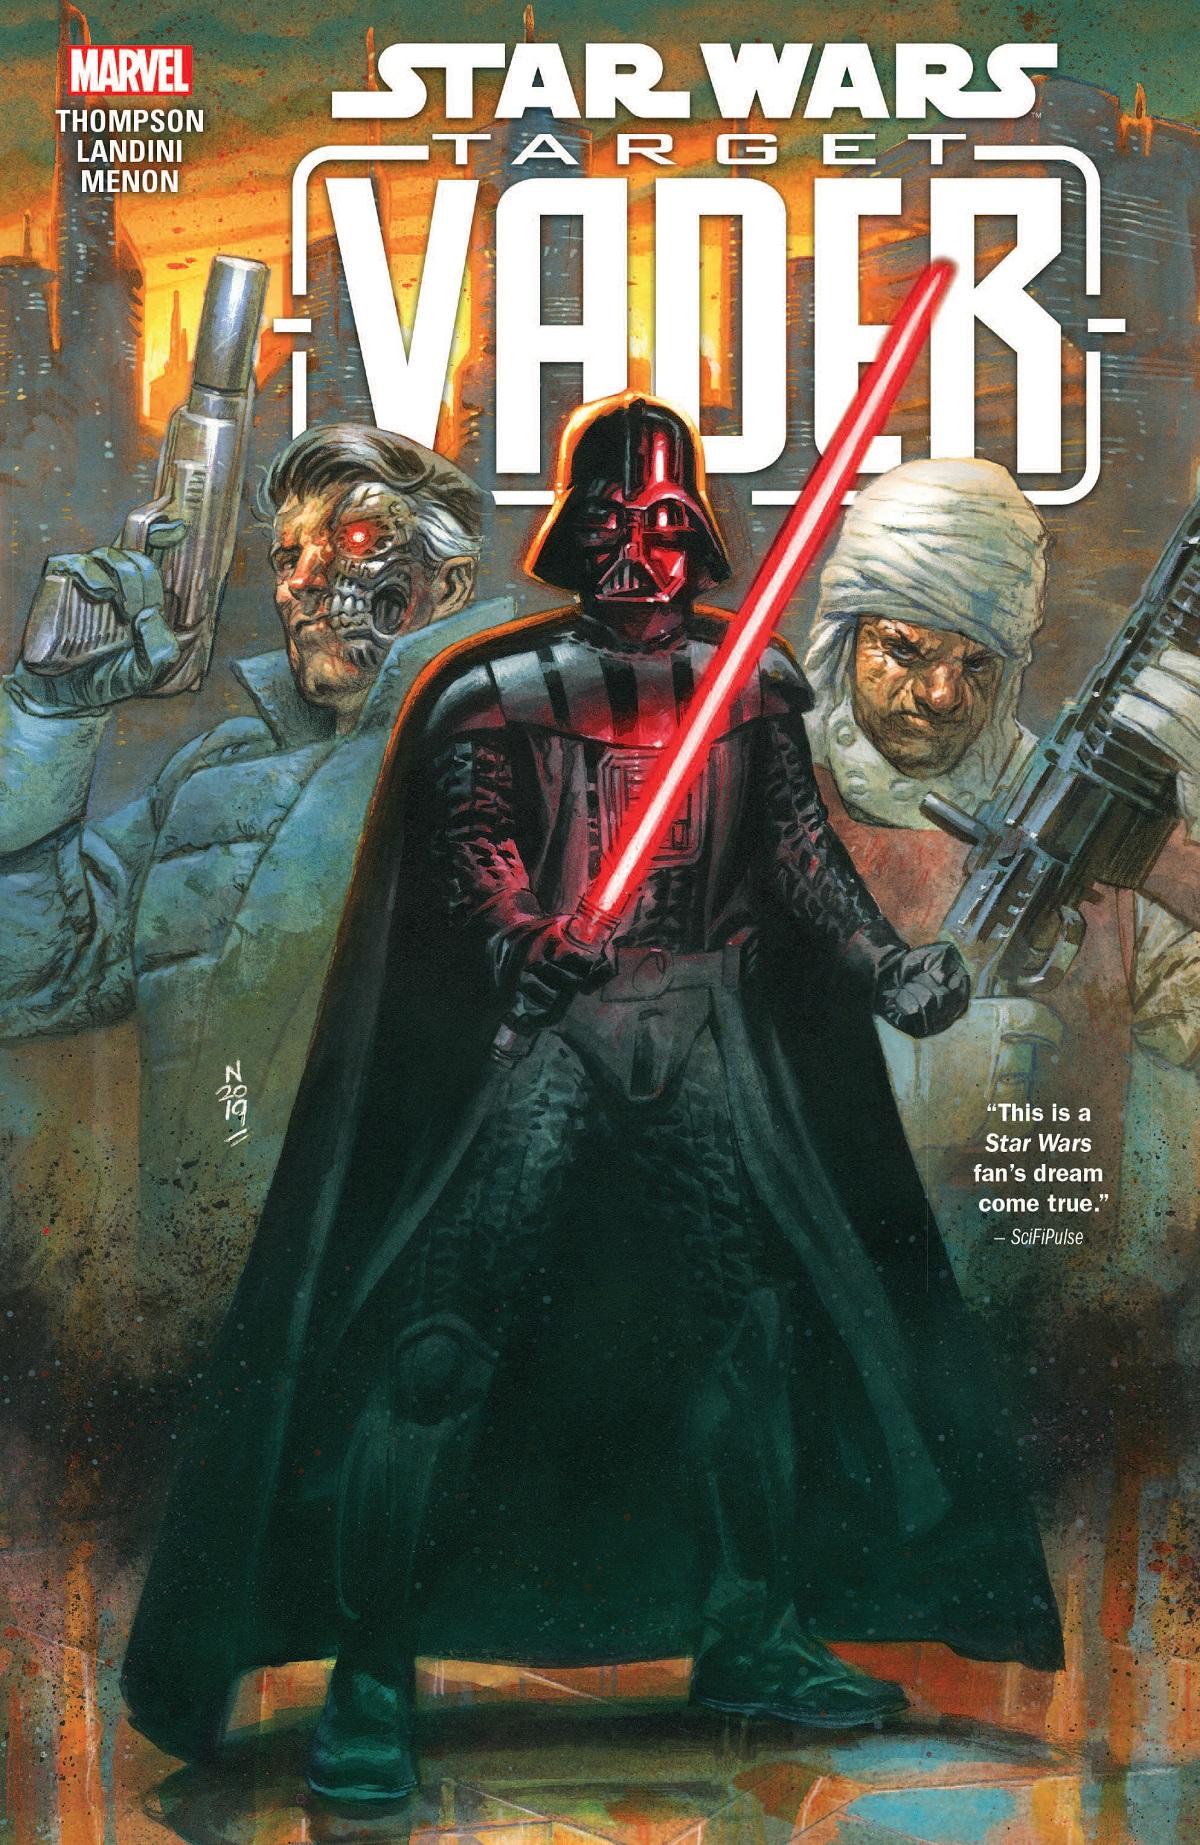 Star Wars: Target Vader (TPB)